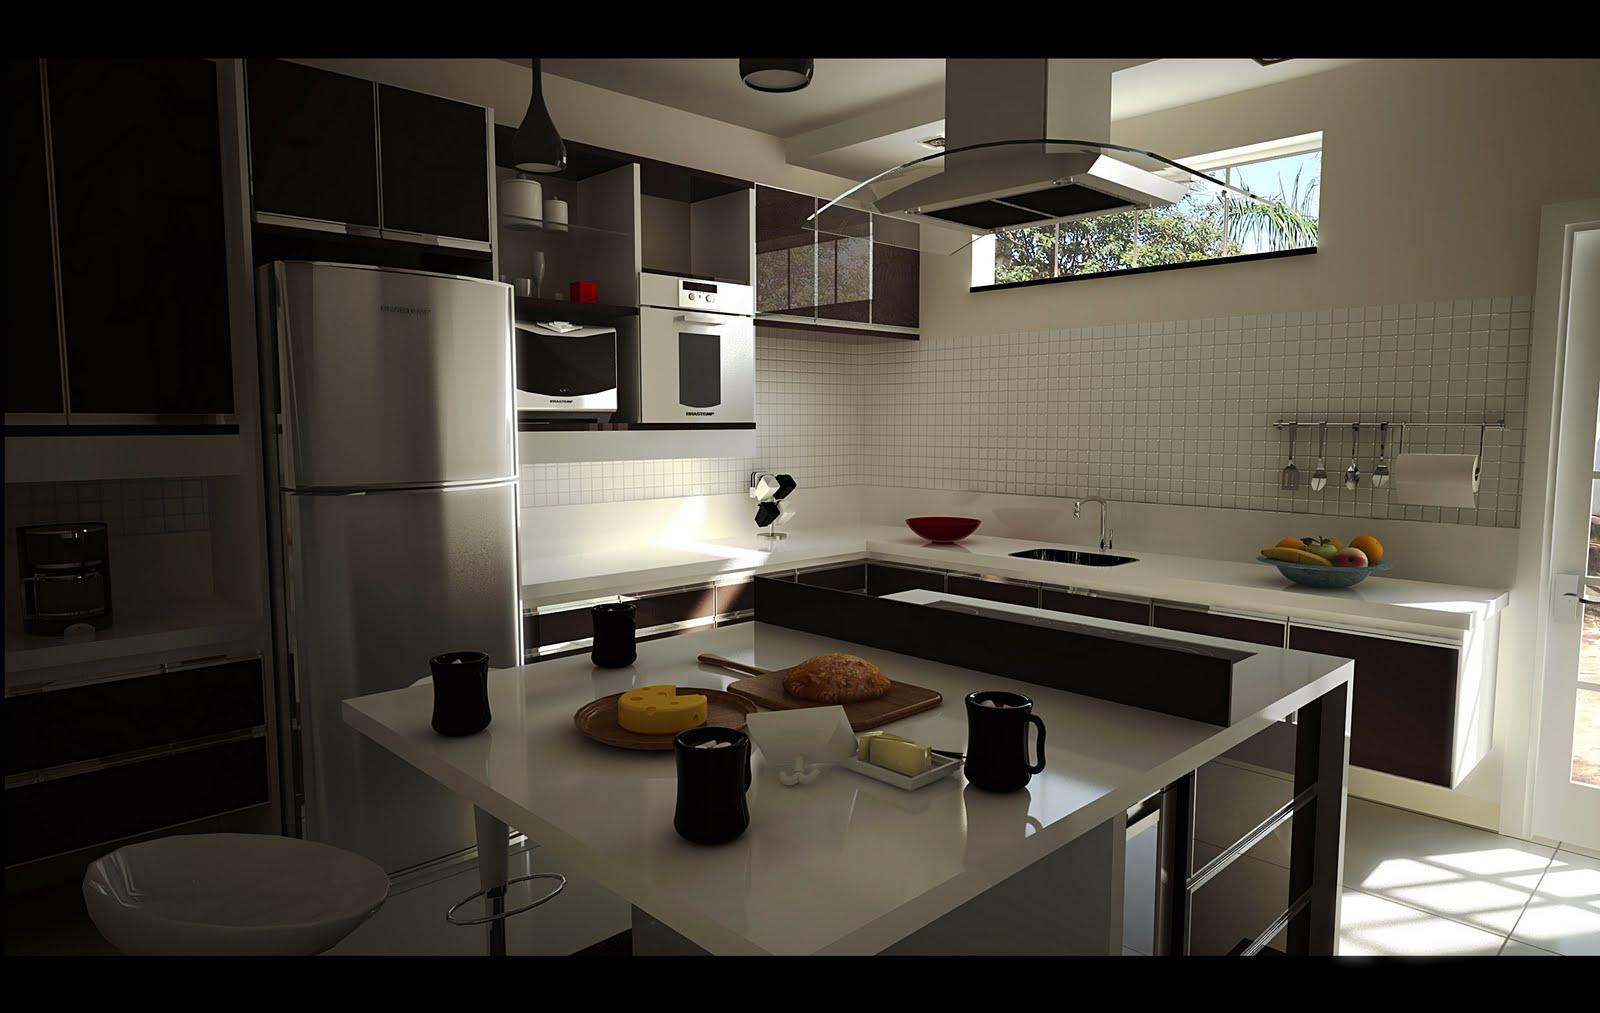 Projeto cozinha #1C1814 1600 1013